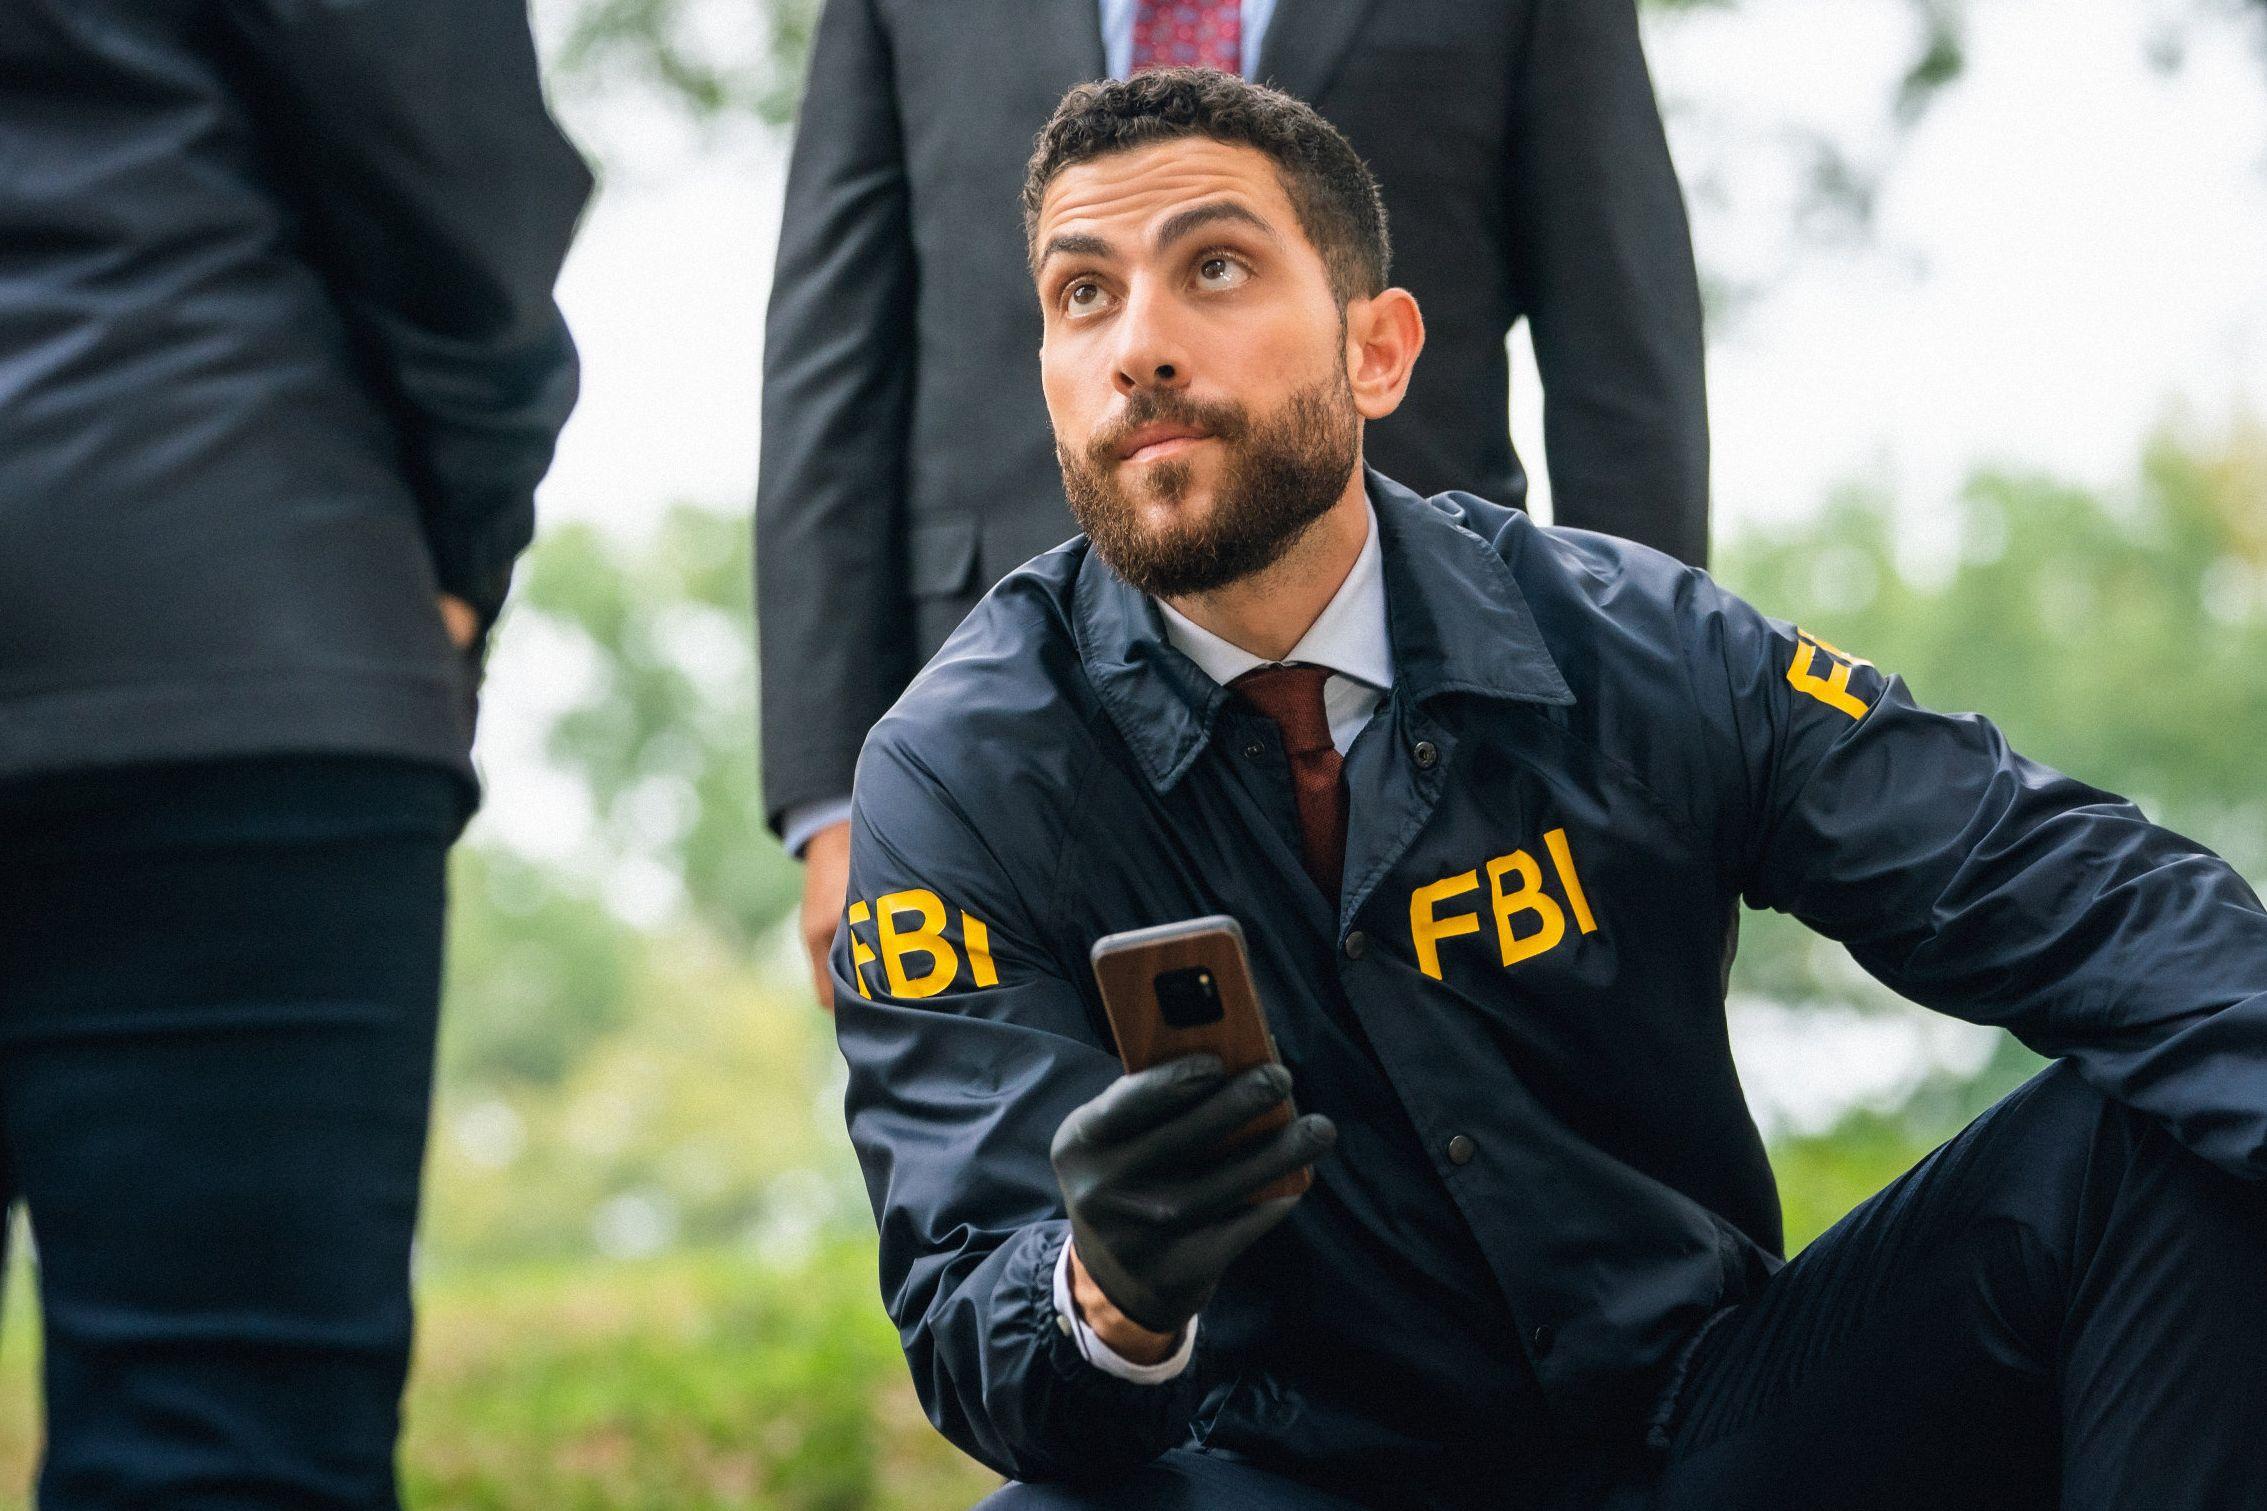 Actor Zeeko Zaki wears an FBI windbreaker while holding up a cell phone